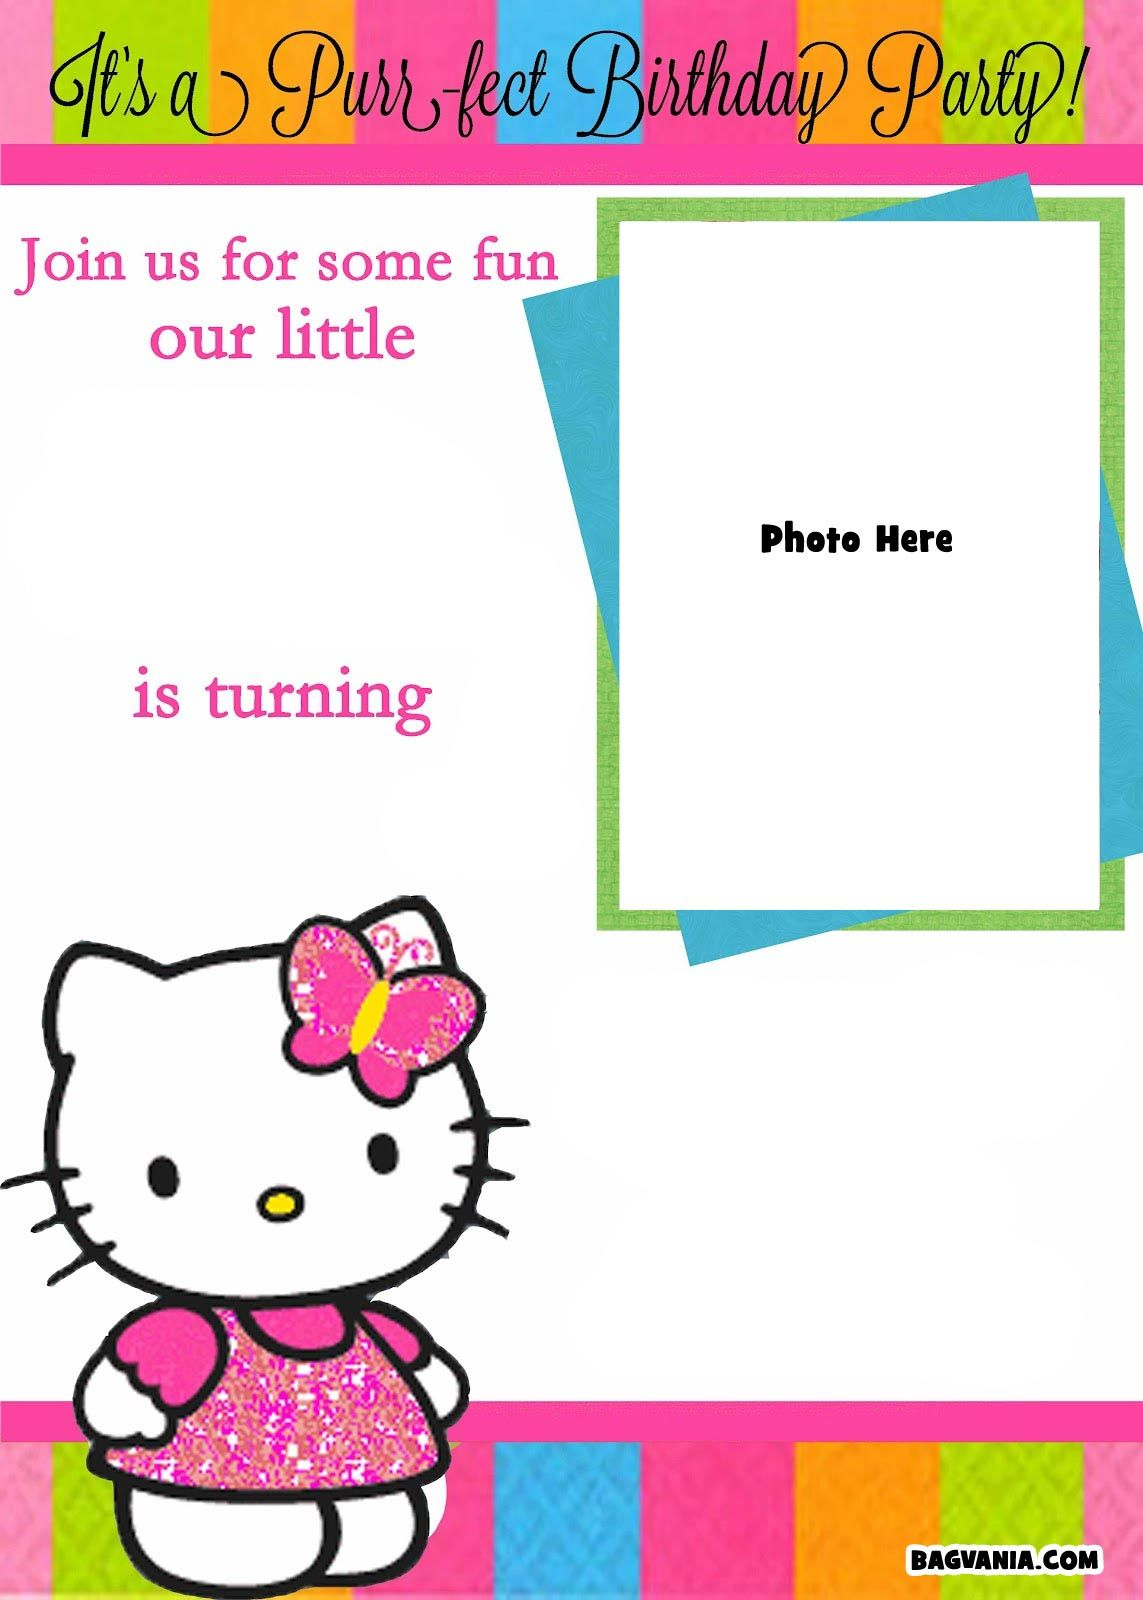 Free Printable Photo Birthday Invitations Bagvania